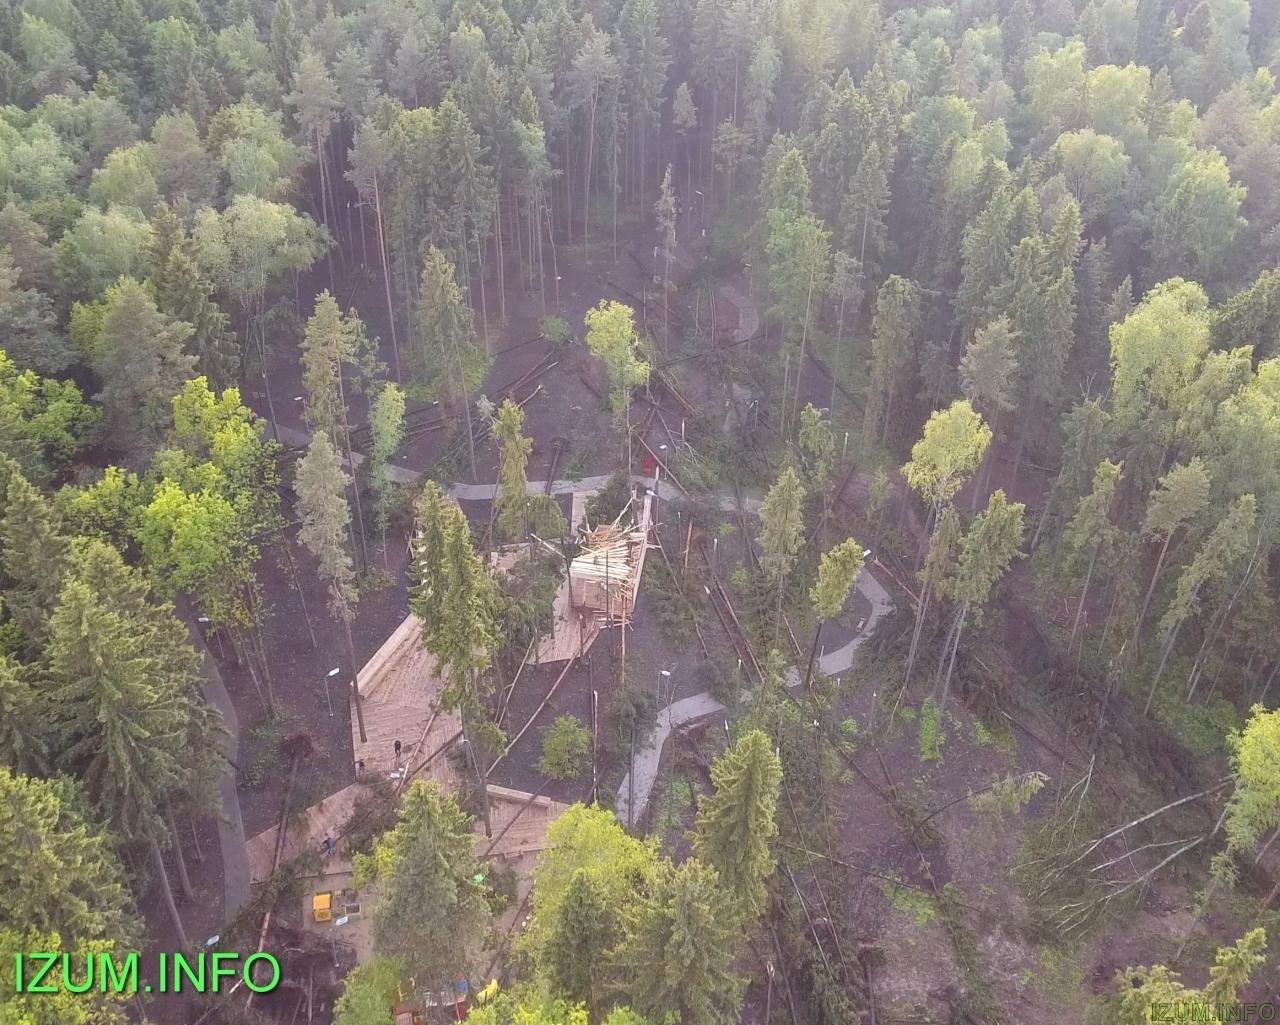 Изумрудные холмы парк после урагана (2).jpg